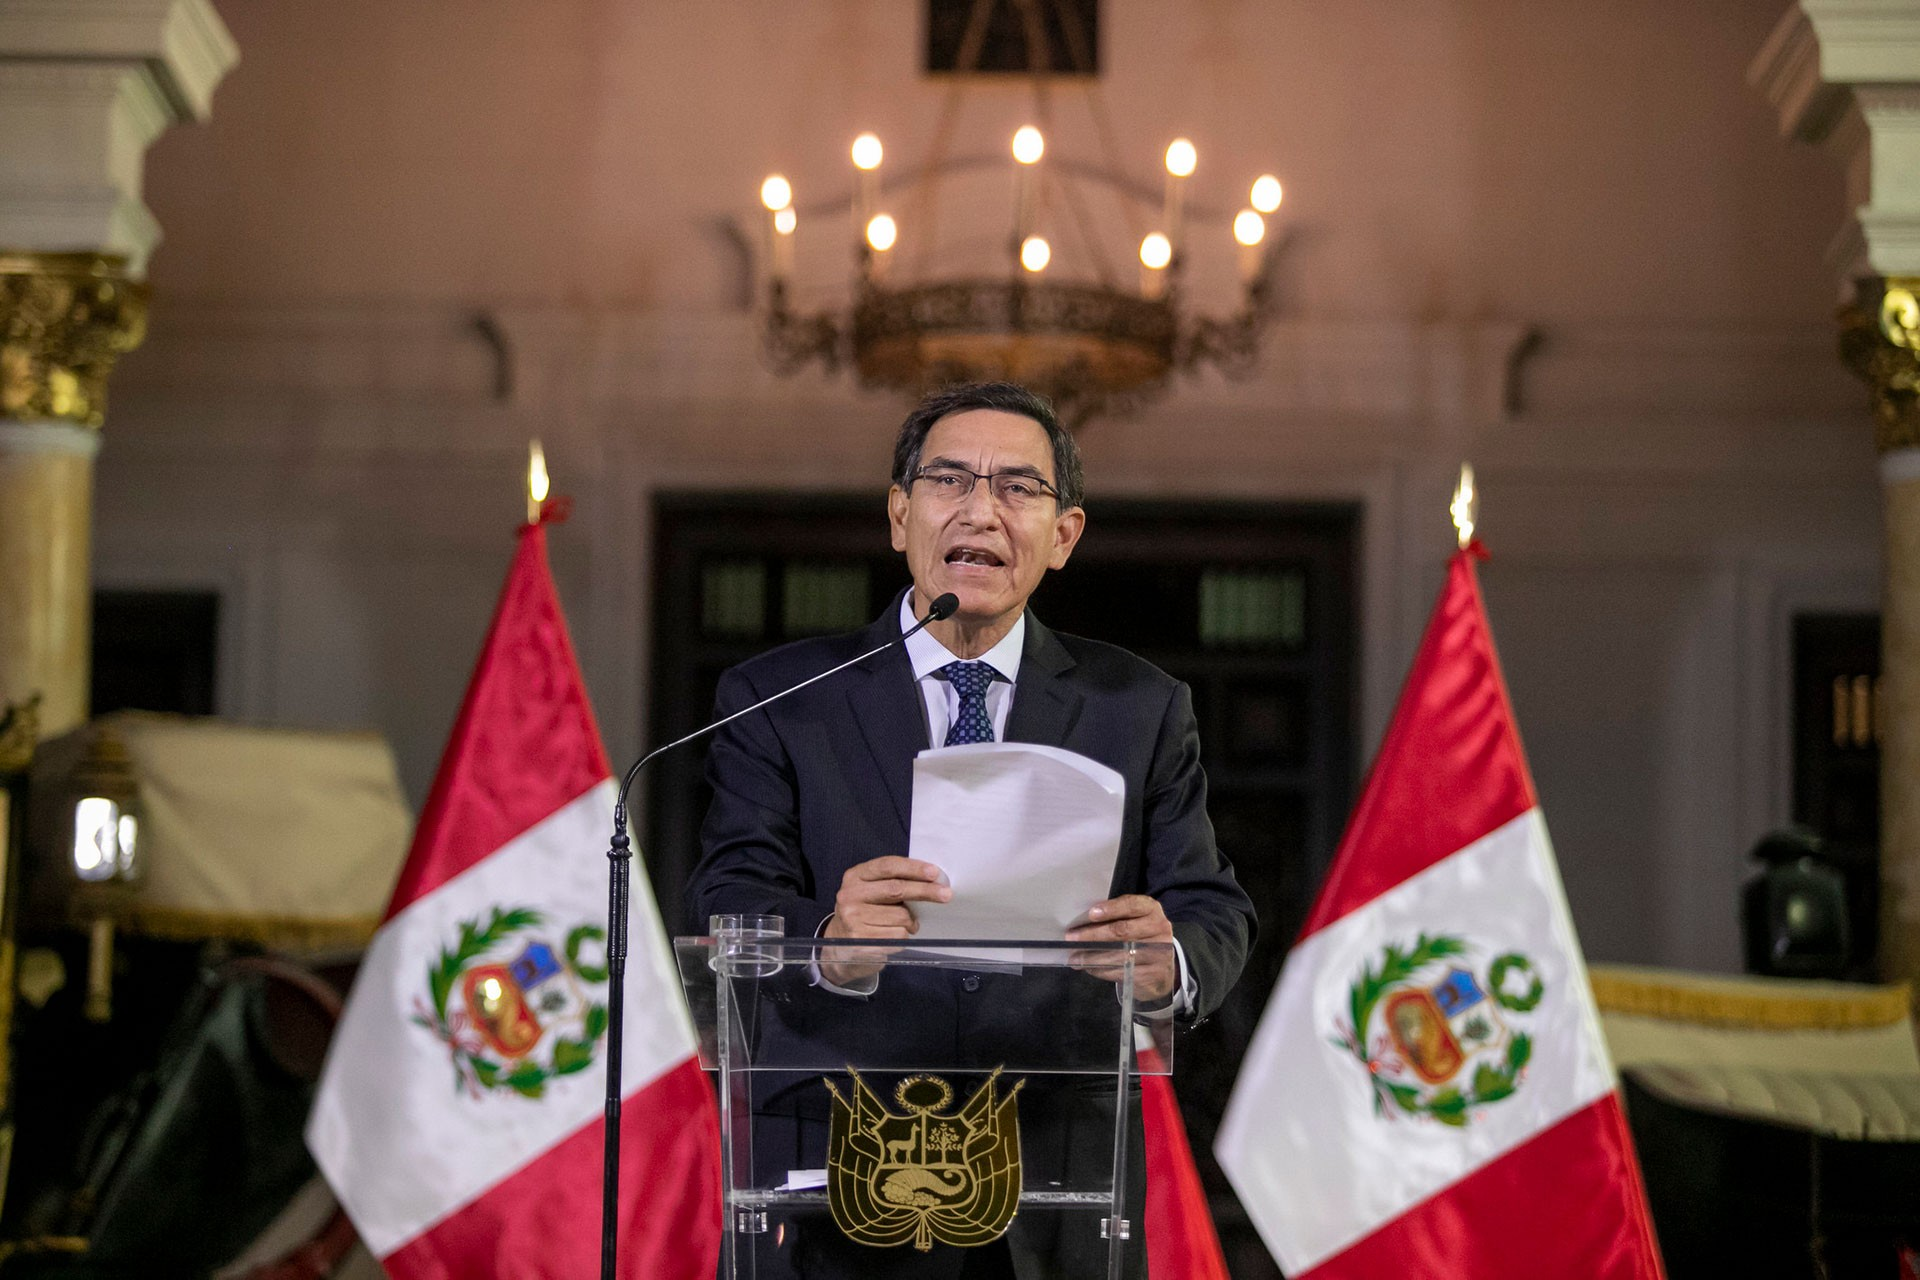 Peru'da Devlet Başkanı Vizcarra Parlamentoyu, Parlamento Devlet Başkanı'nı feshetti